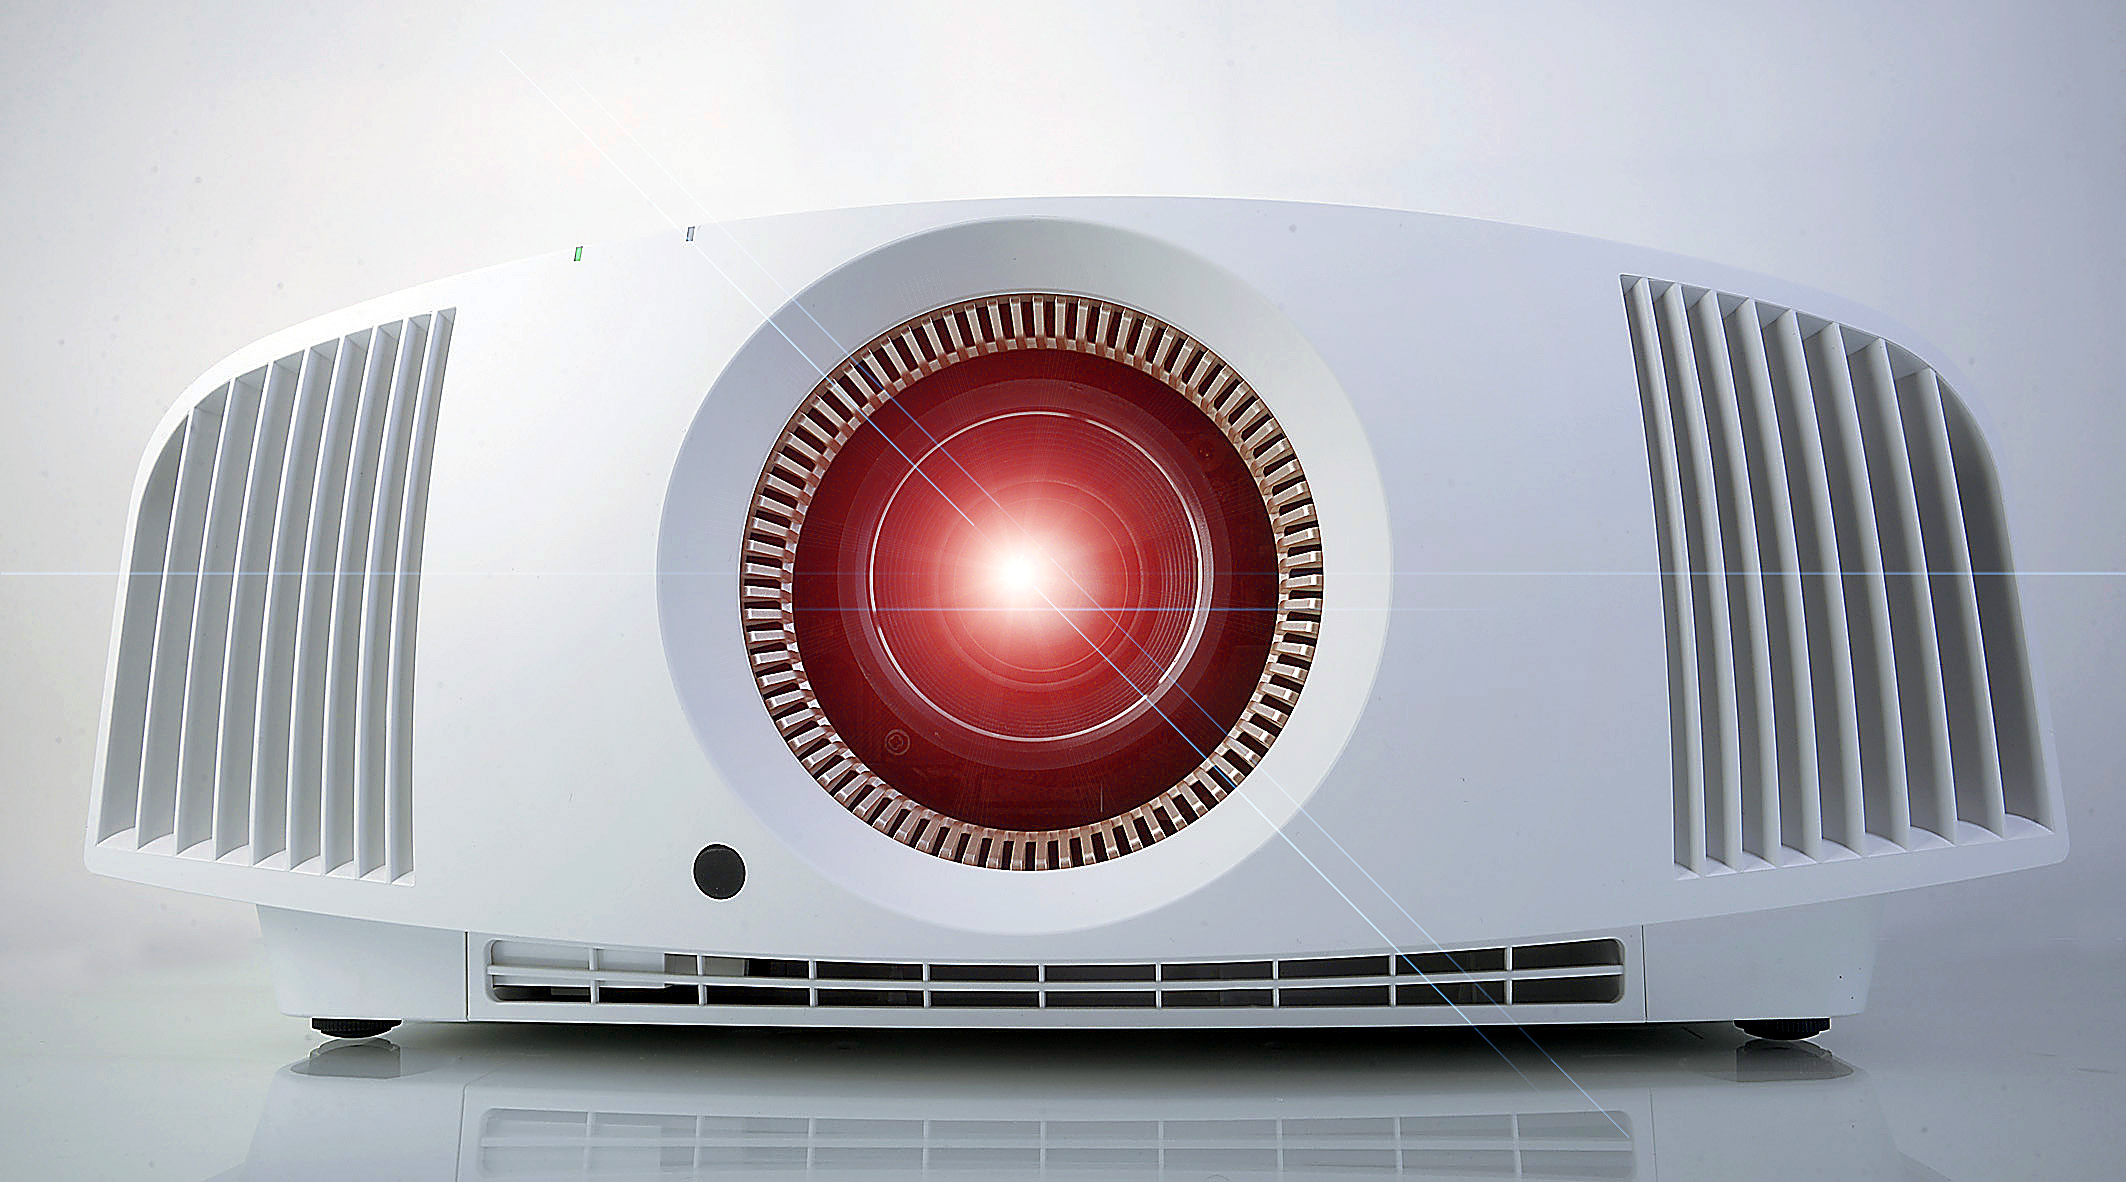 Sony VPL-VW550 mit Lens-Flares - Foto Michael B. Rehders